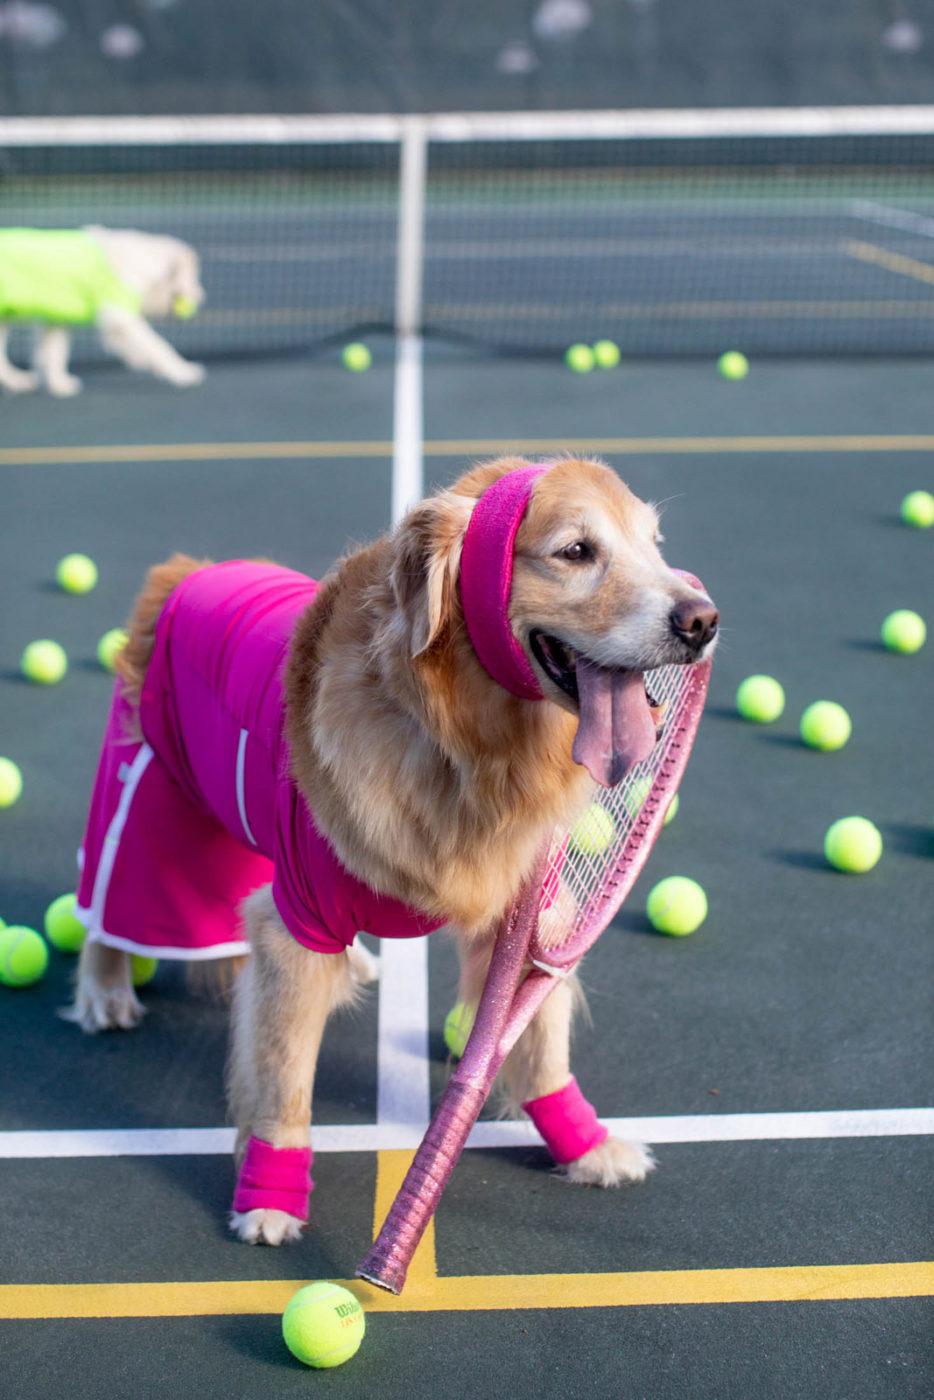 Best Dog Halloween Costume Sunshine The Golden Retriever